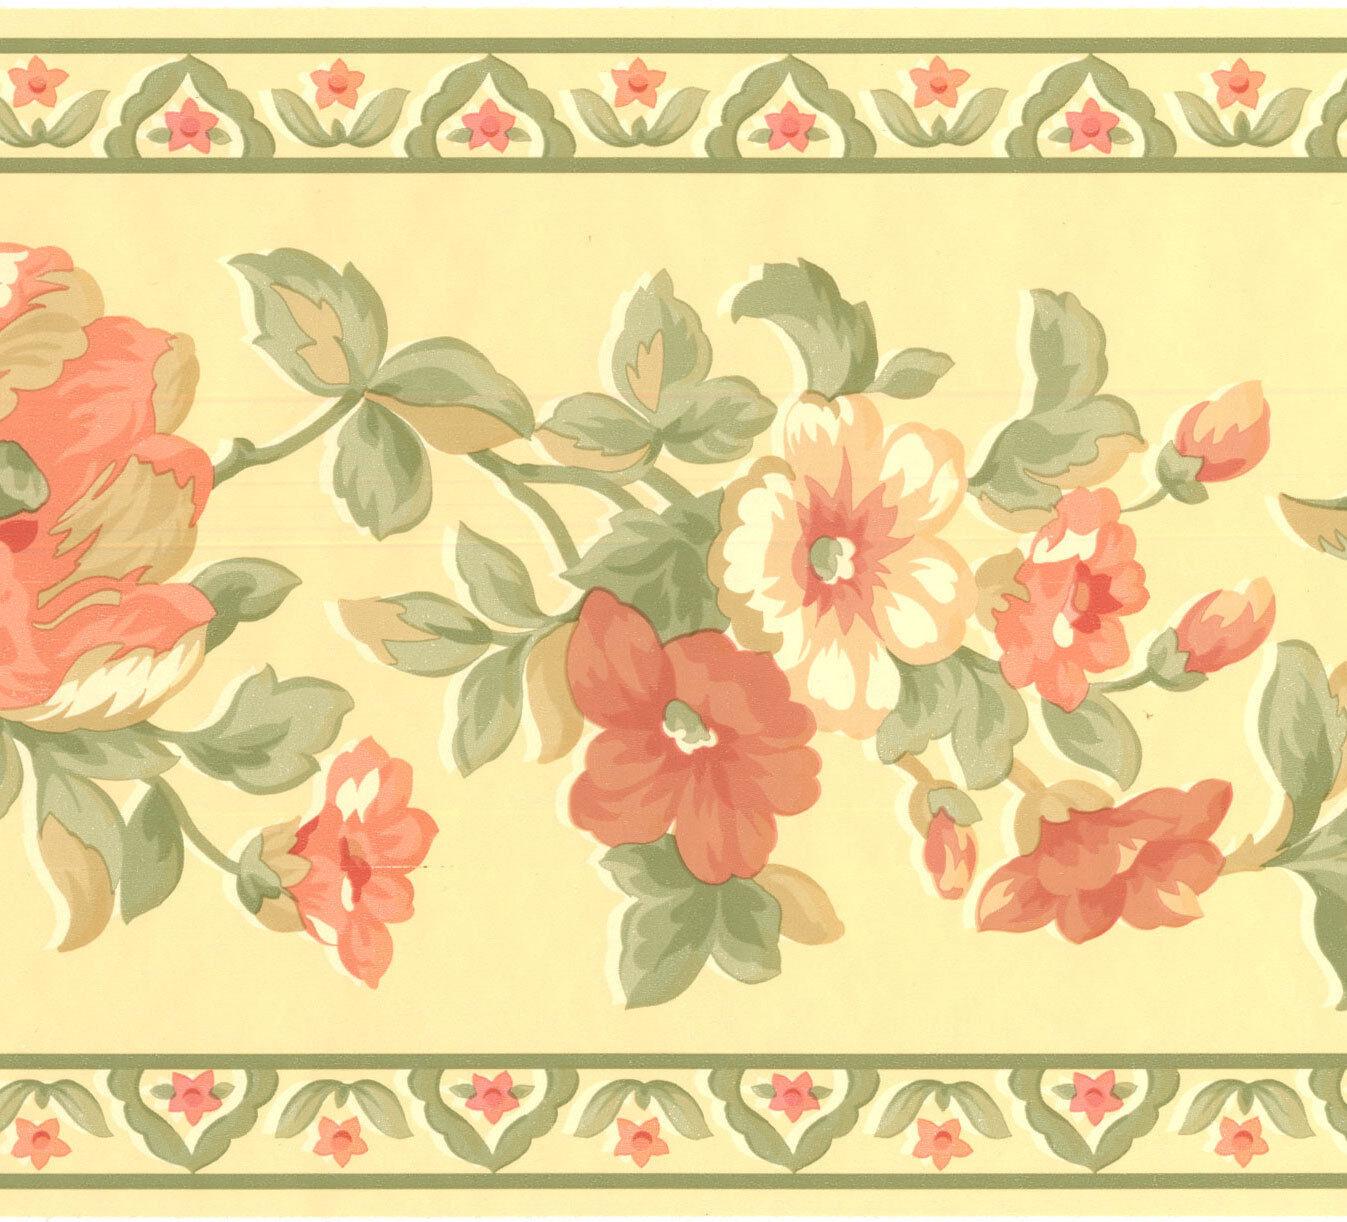 Pretty Tan Peach Apricot Flowers Floral Wallpaper Wall Border